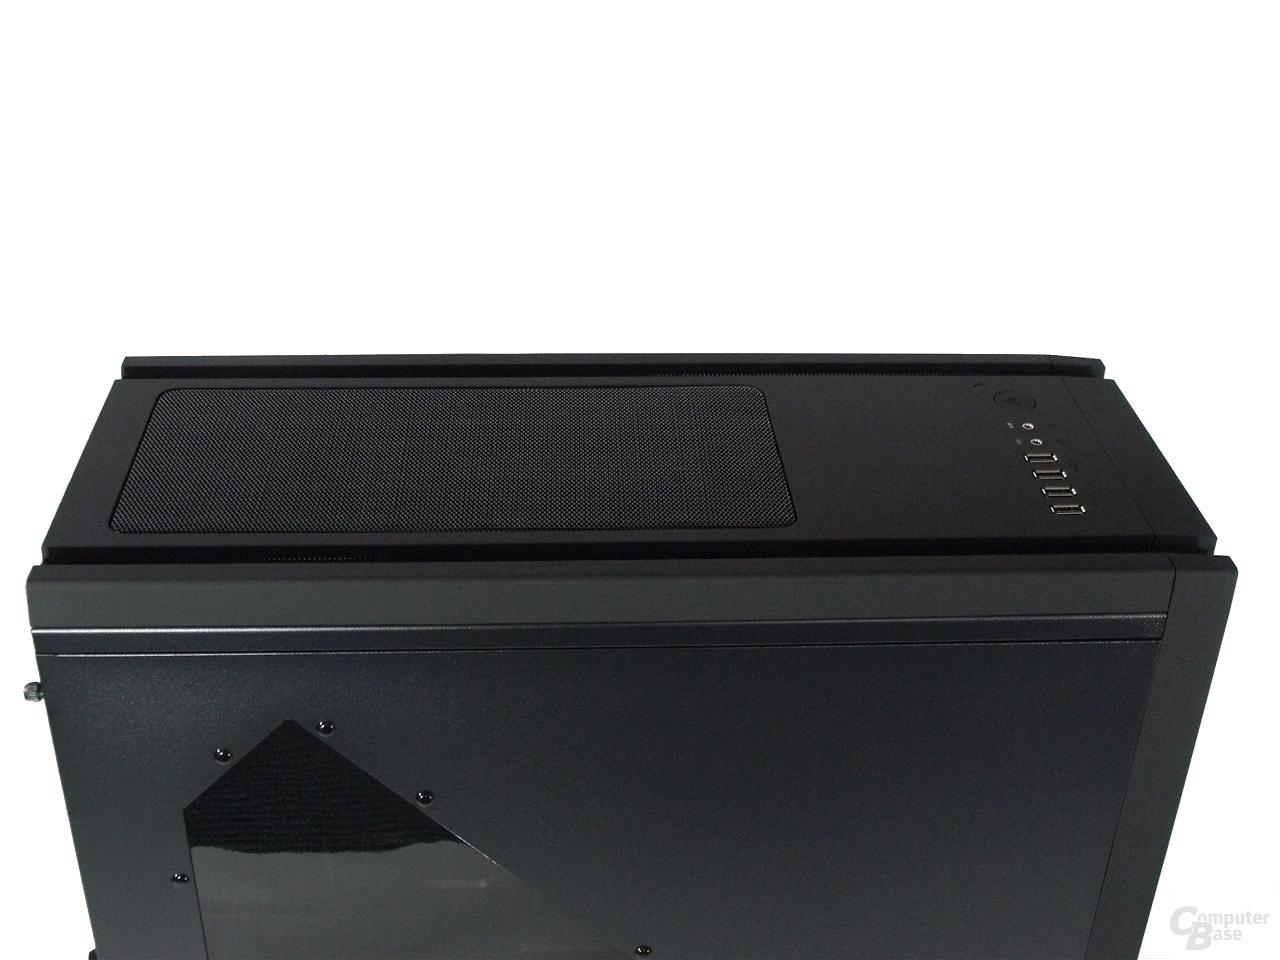 BitFenix Shinobi – Deckel mit Top-Cover